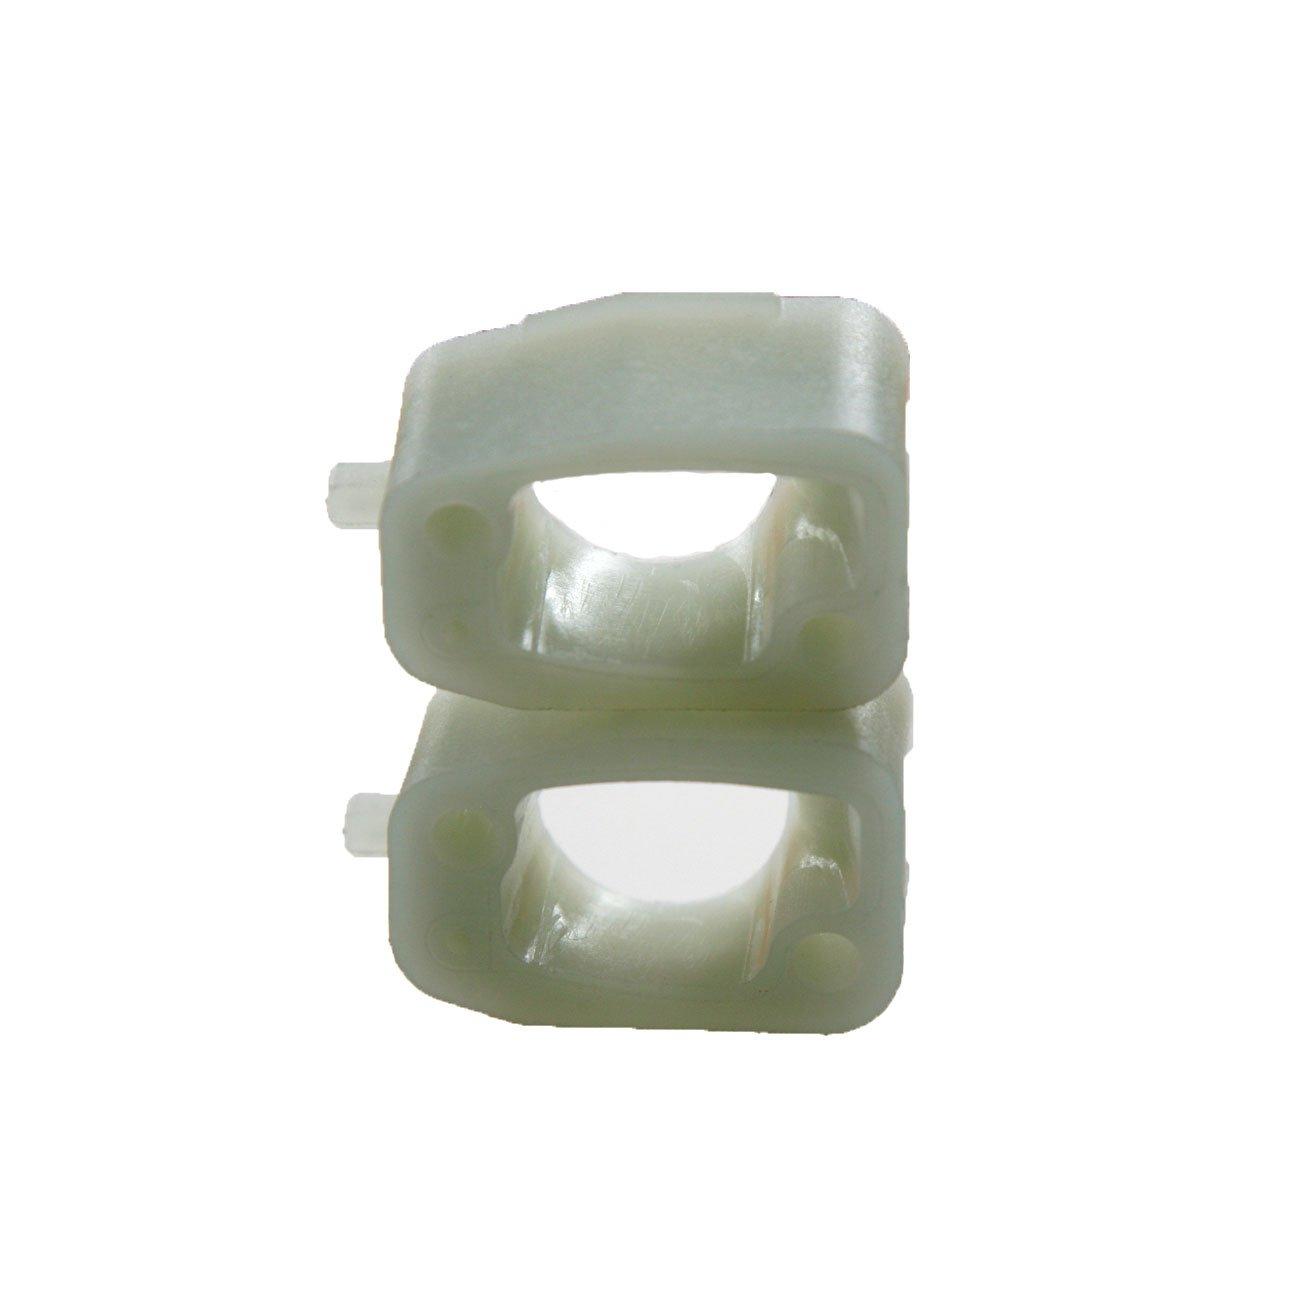 JRL 2X Intake manifold Spacer for Husqvarna 61 268 272 272xp 268xp NEW 501 80 66 02